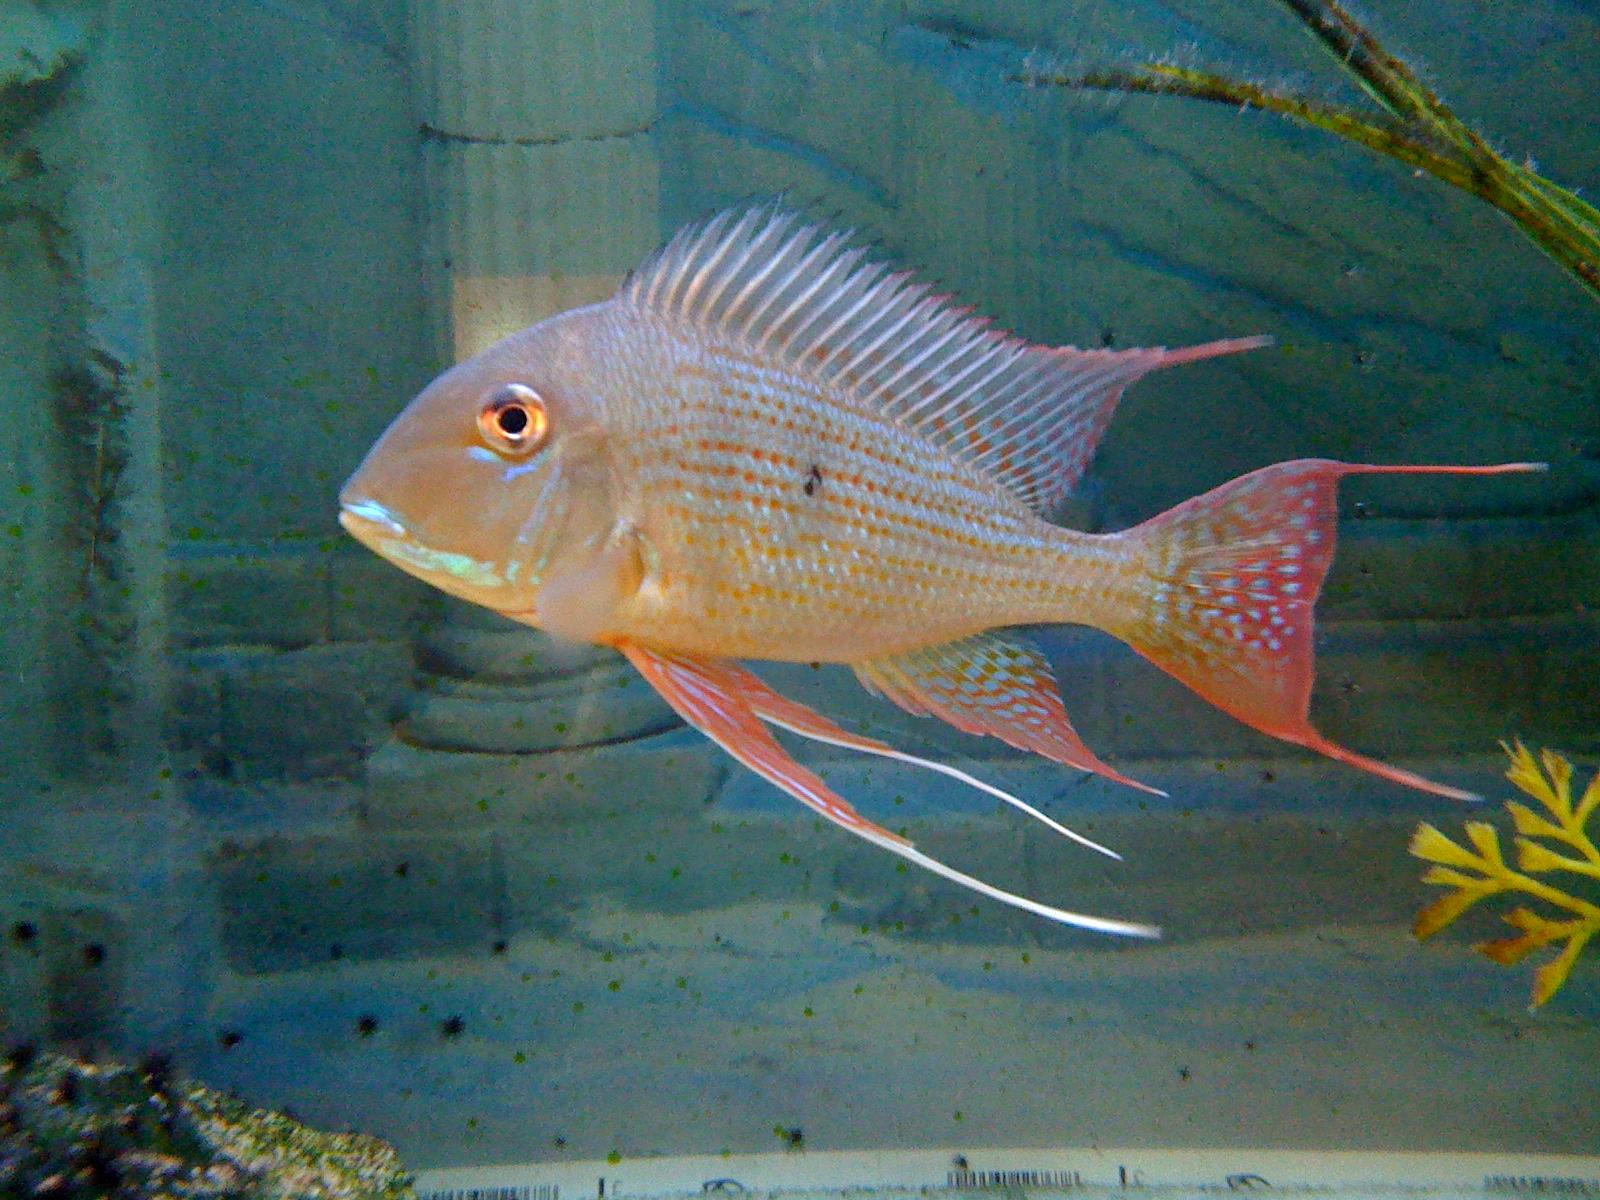 cichlids.com: Geophagus altifrons